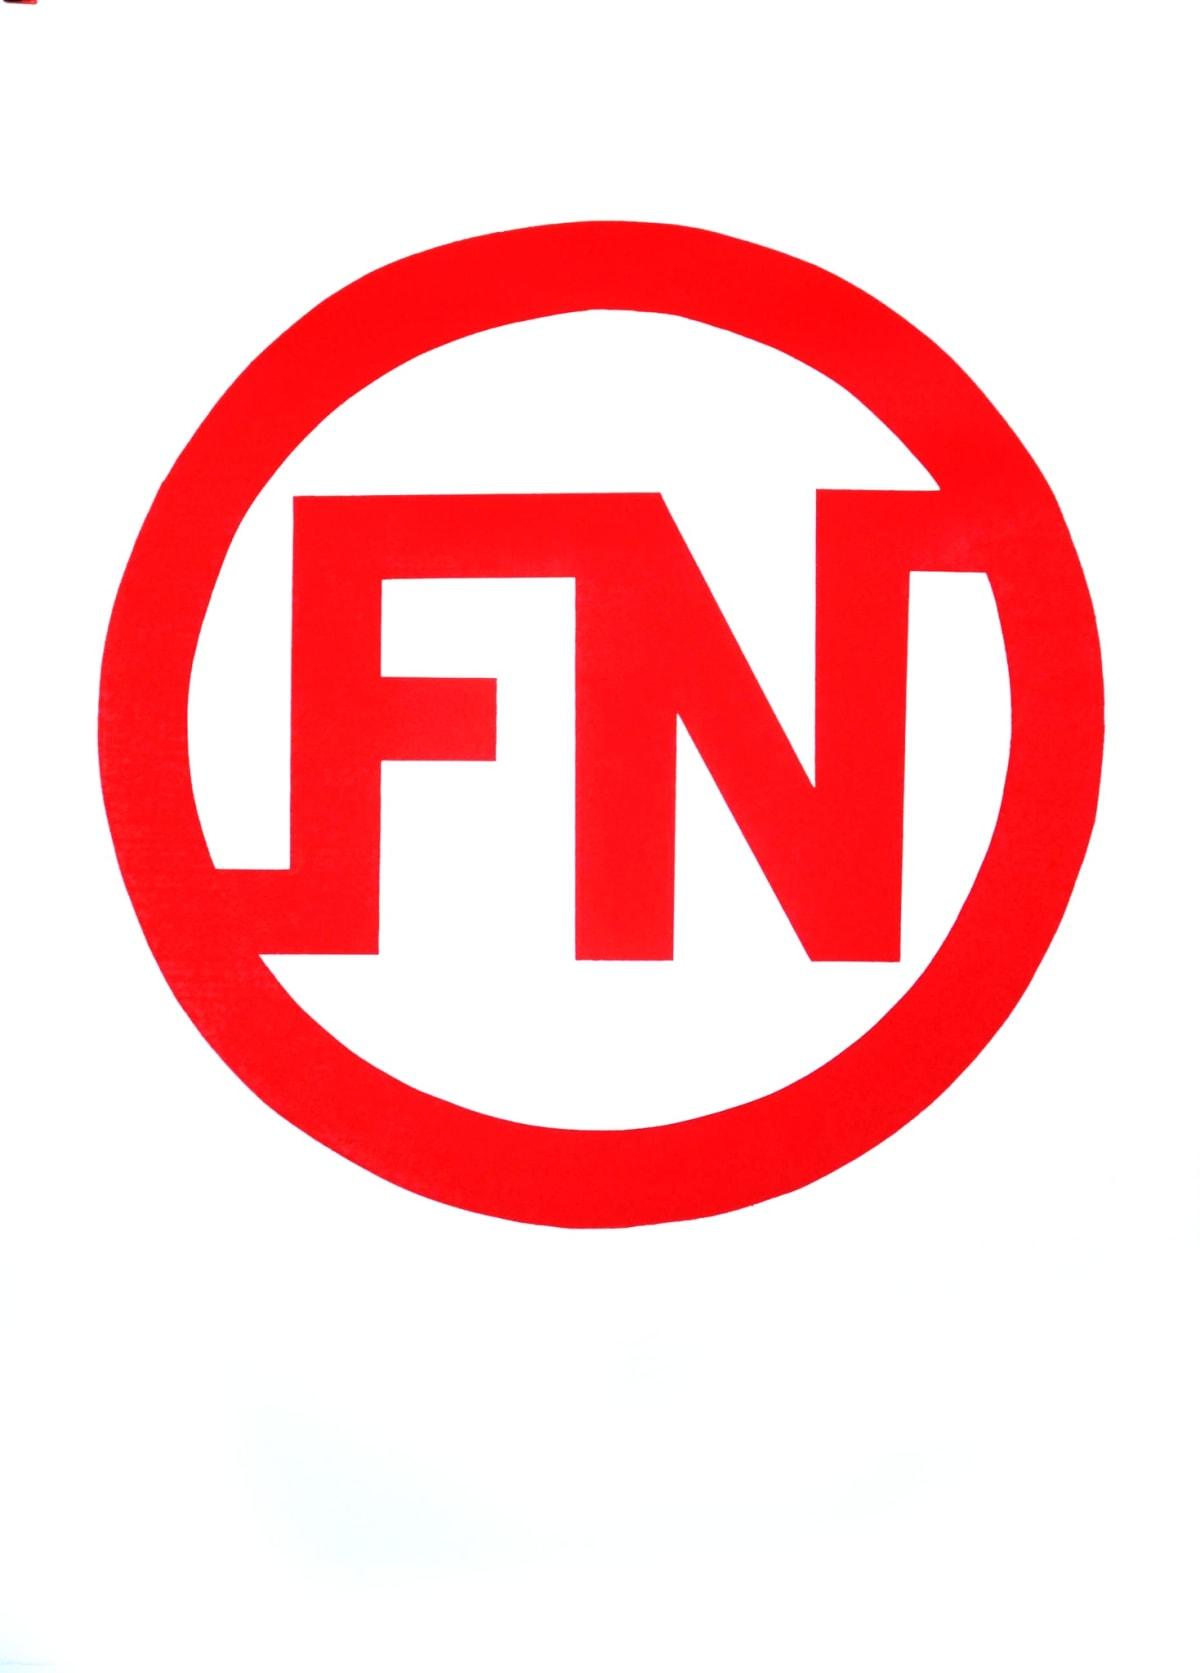 Darren Coffield and Graham Bignell FN Logo, 2013 Letterpress print on Zerkall 145gsm. Edition of 10. Numbered by Darren Coffield with FN logo blind stamp lower right corner. 42 x 59 cm Edition of 10